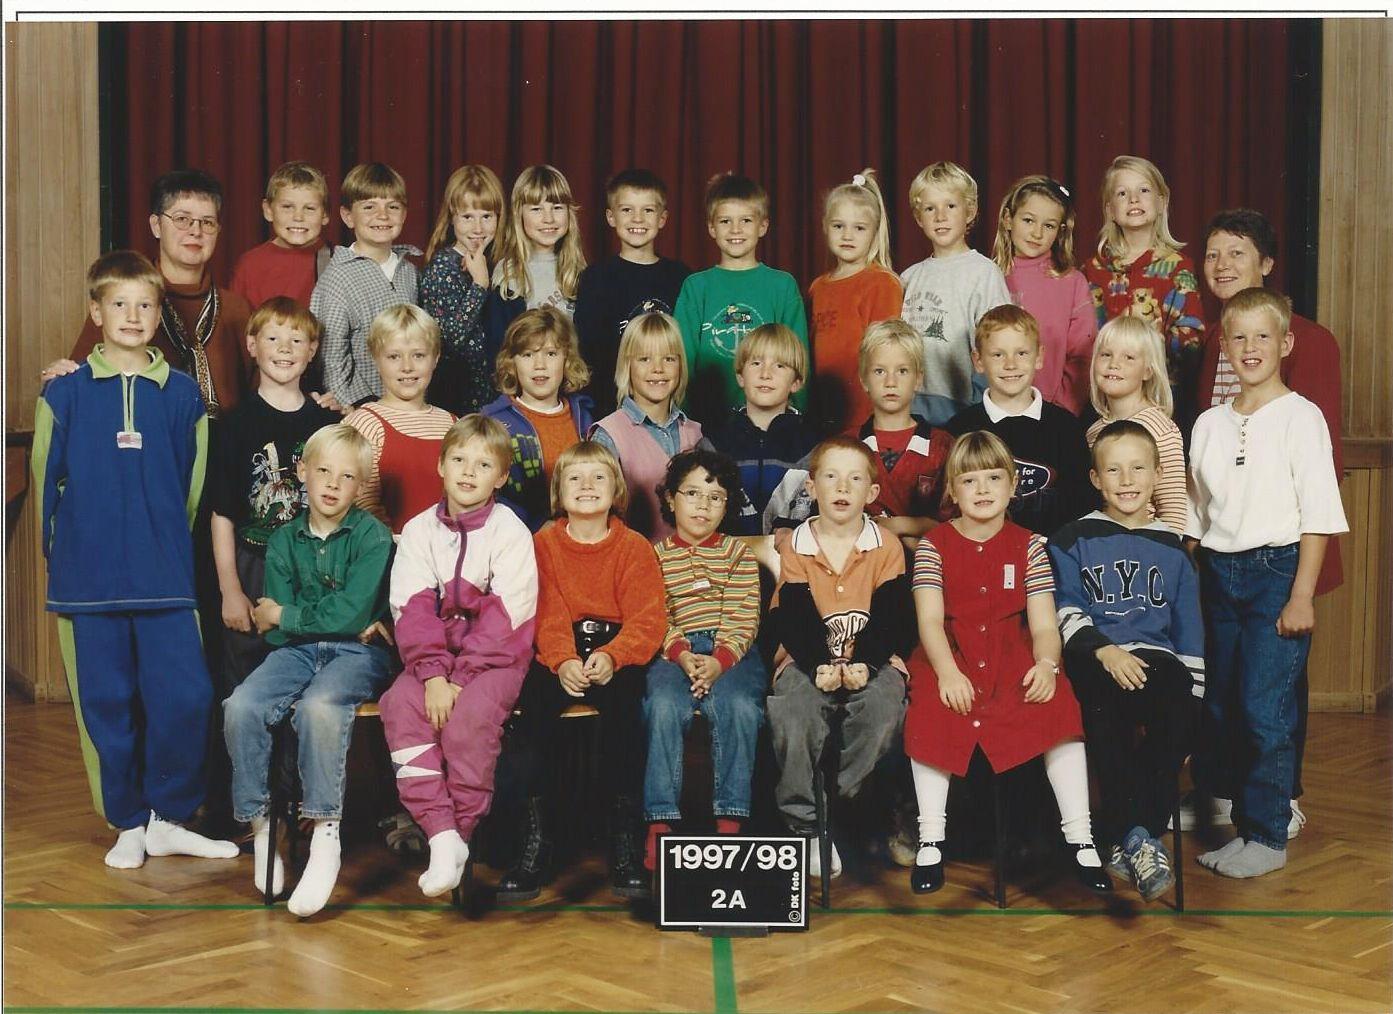 1997-2a